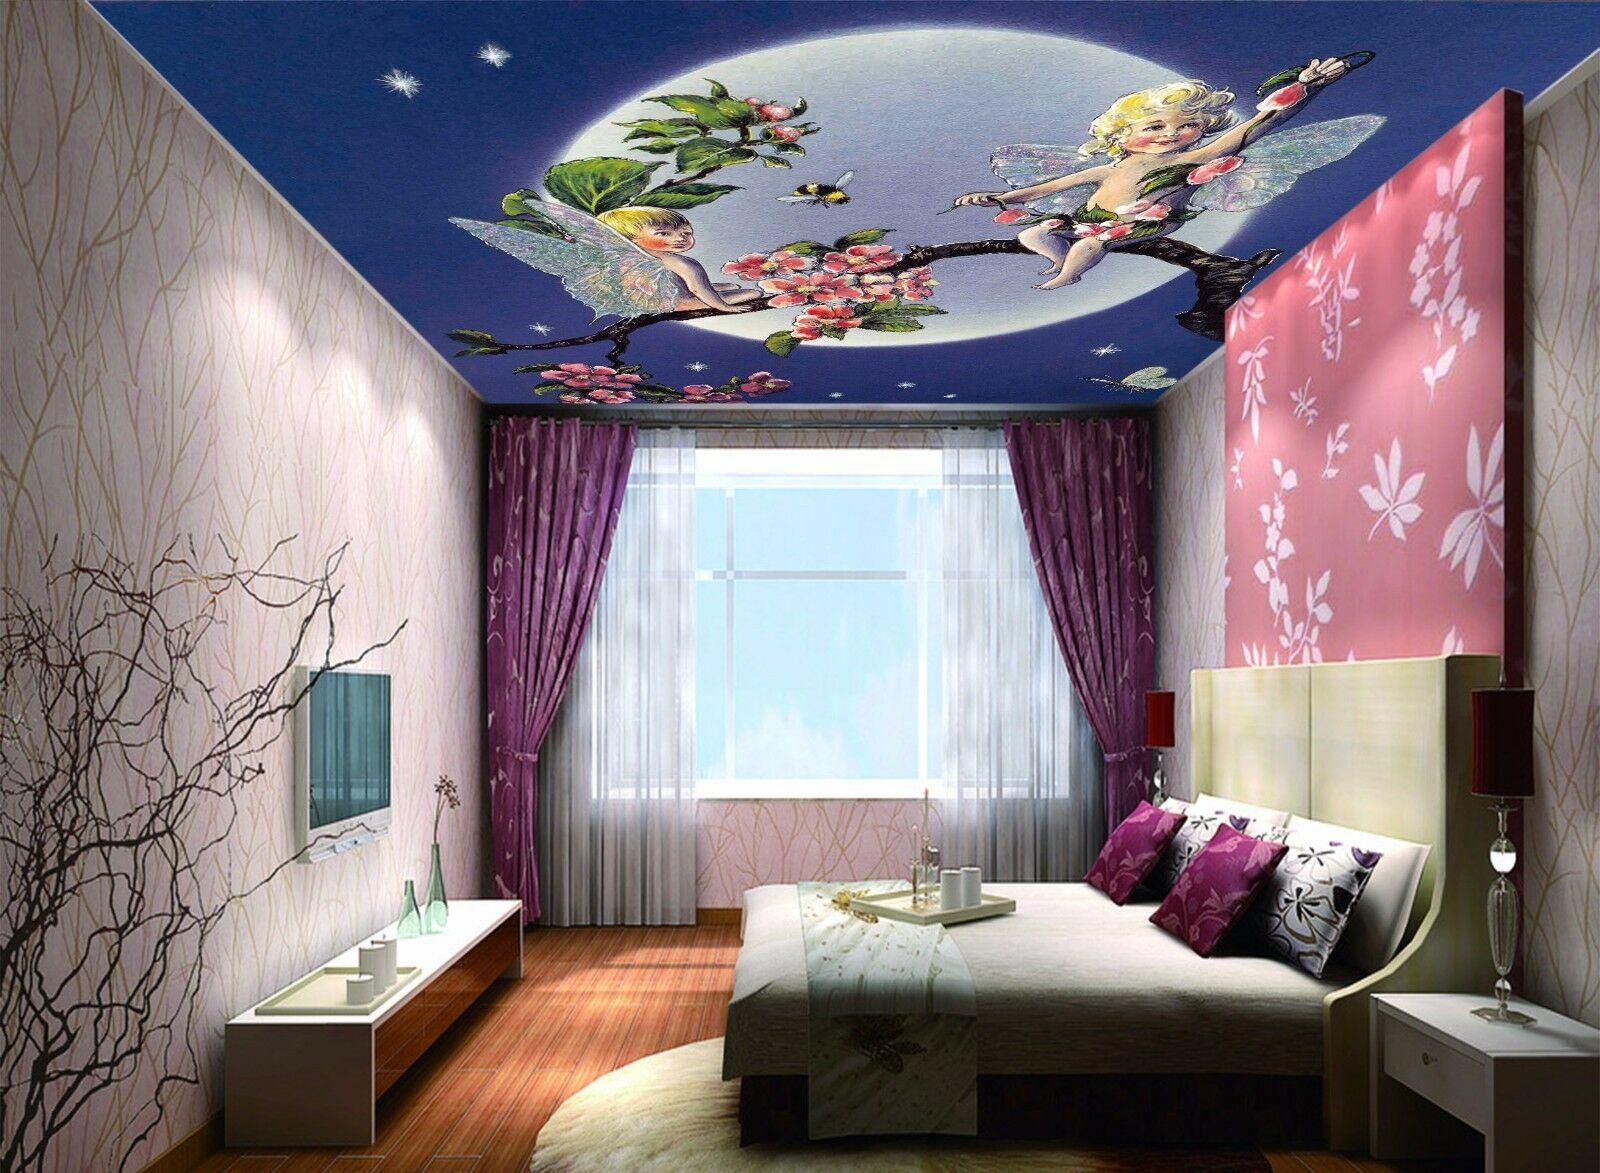 3D Wizard Squid Ceiling WallPaper Murals Wall Print Decal Deco AJ WALLPAPER AU